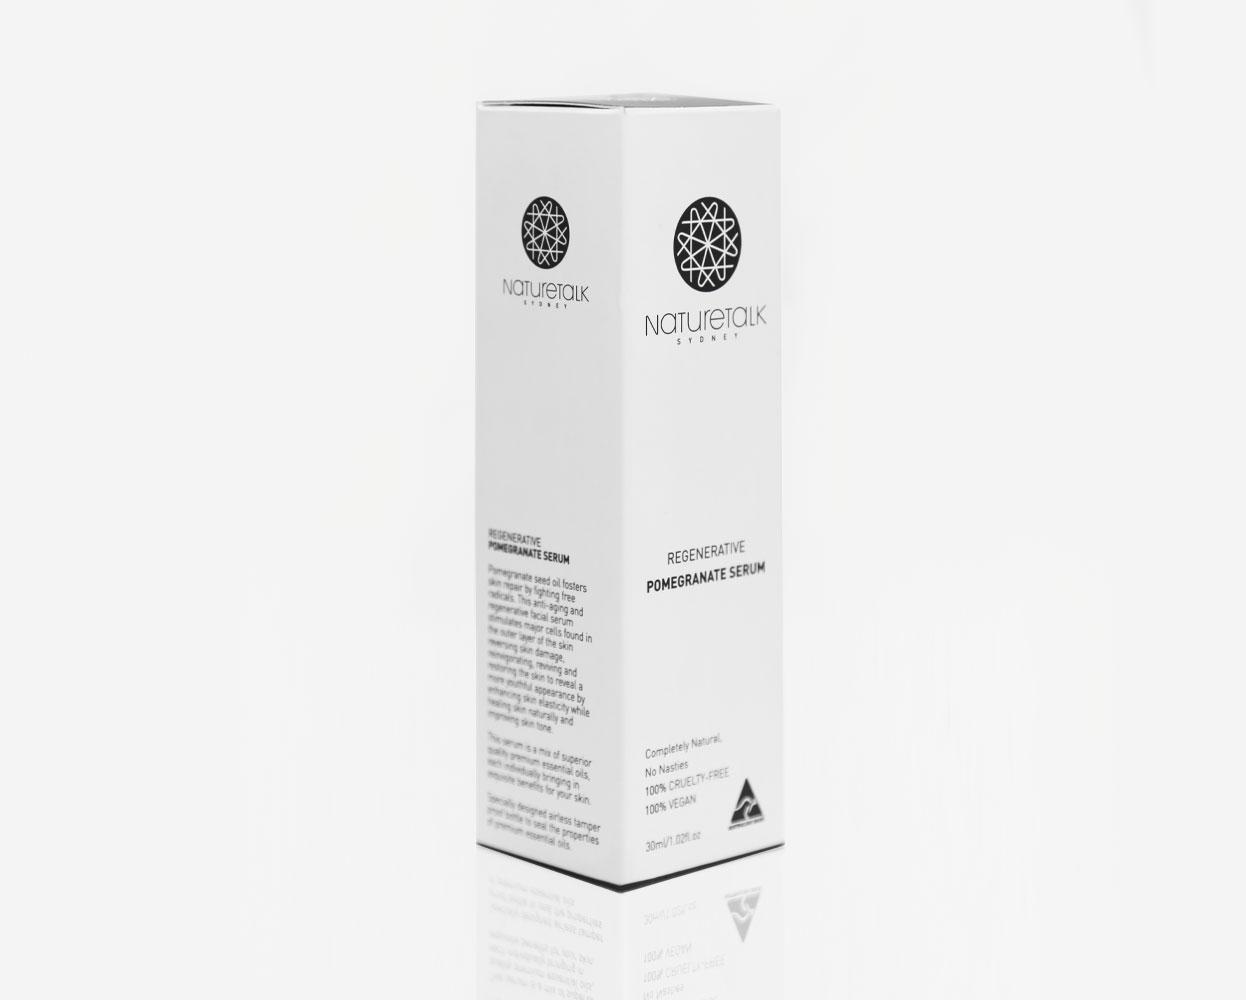 Mela_Creative_Nature_Talk_Packaging_Box_Side